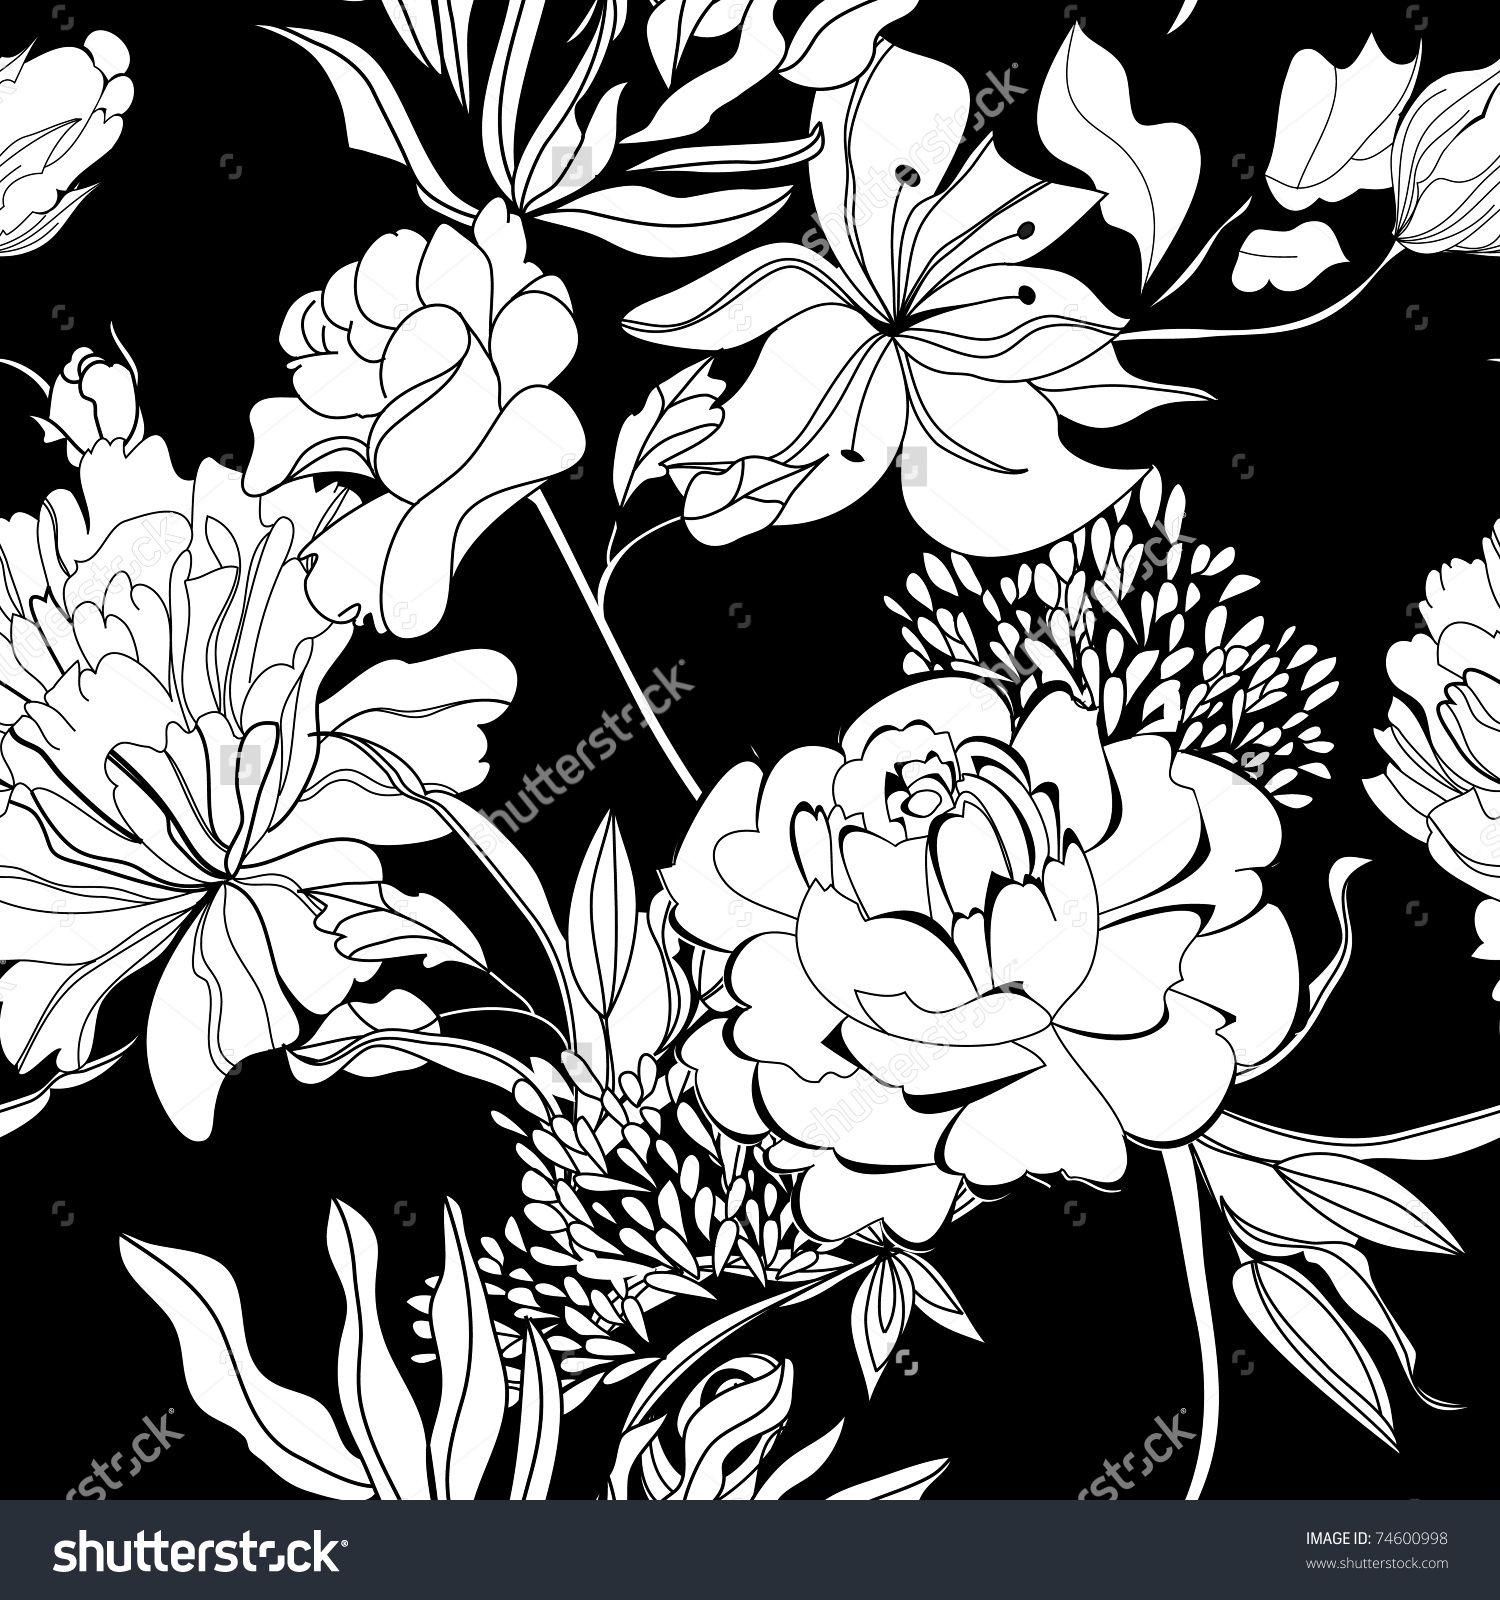 Decorative Seamless Wallpaper With White Flowers On Black Background 库存矢量插图 74600998 Shutterstock